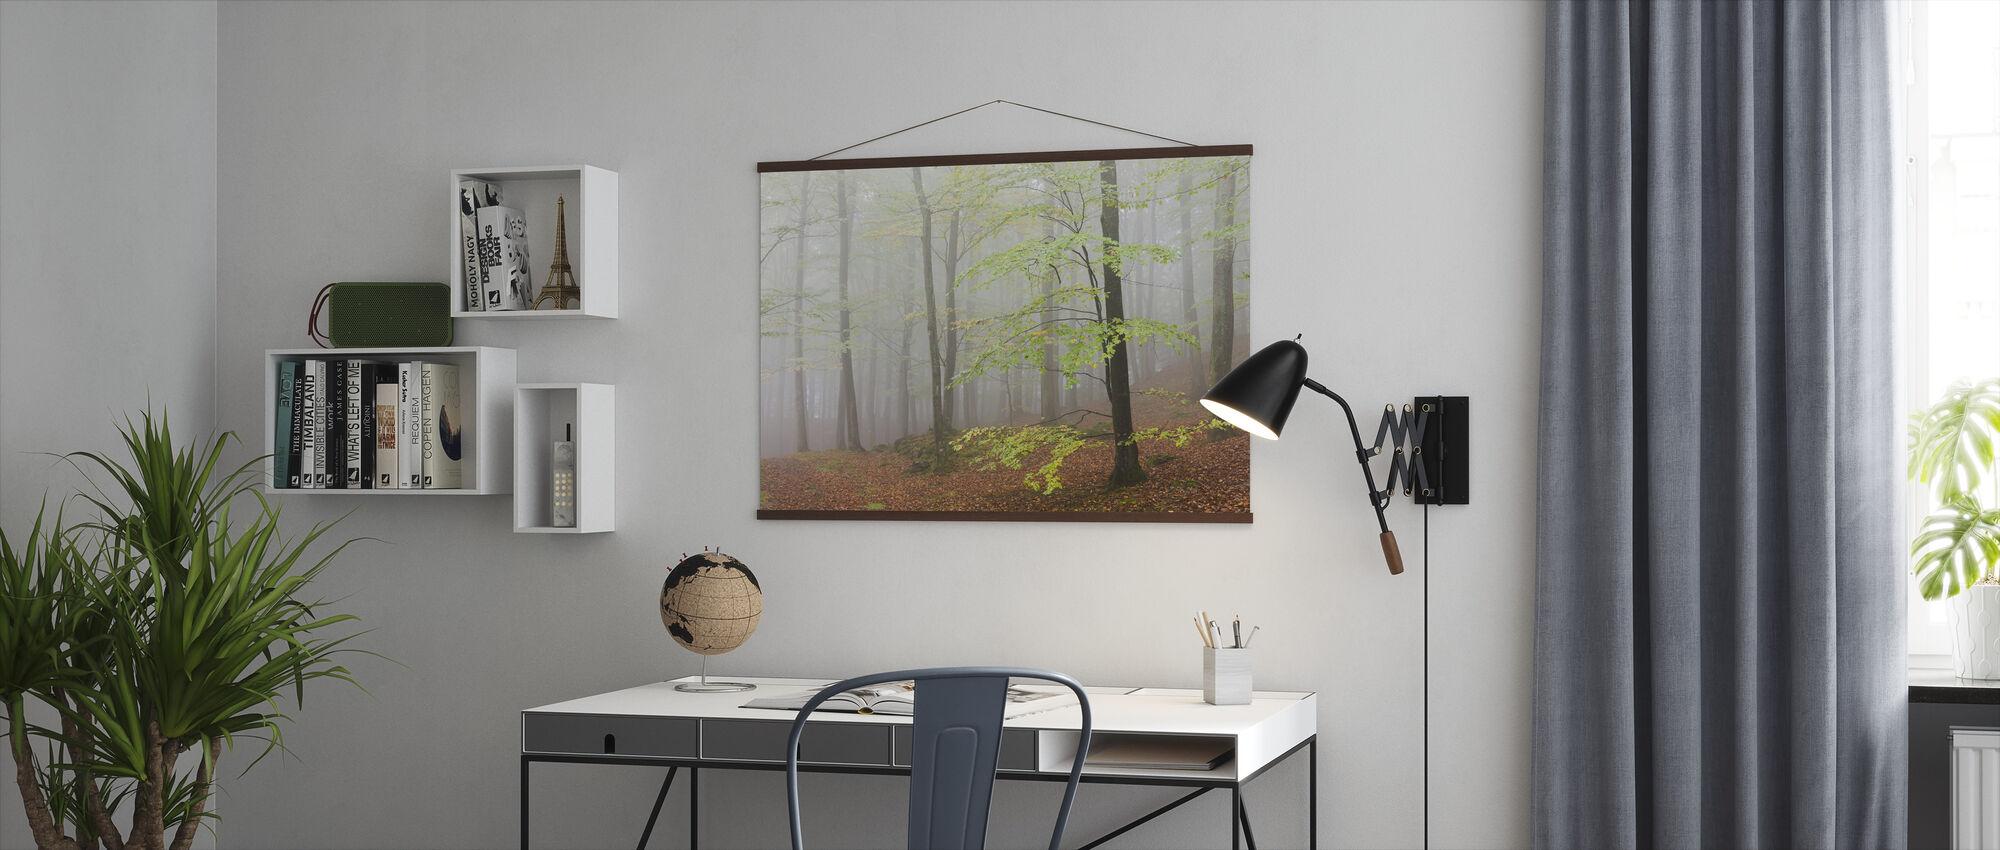 Clowing Hallar Beech Forest, Sweden I, Europe - Poster - Office